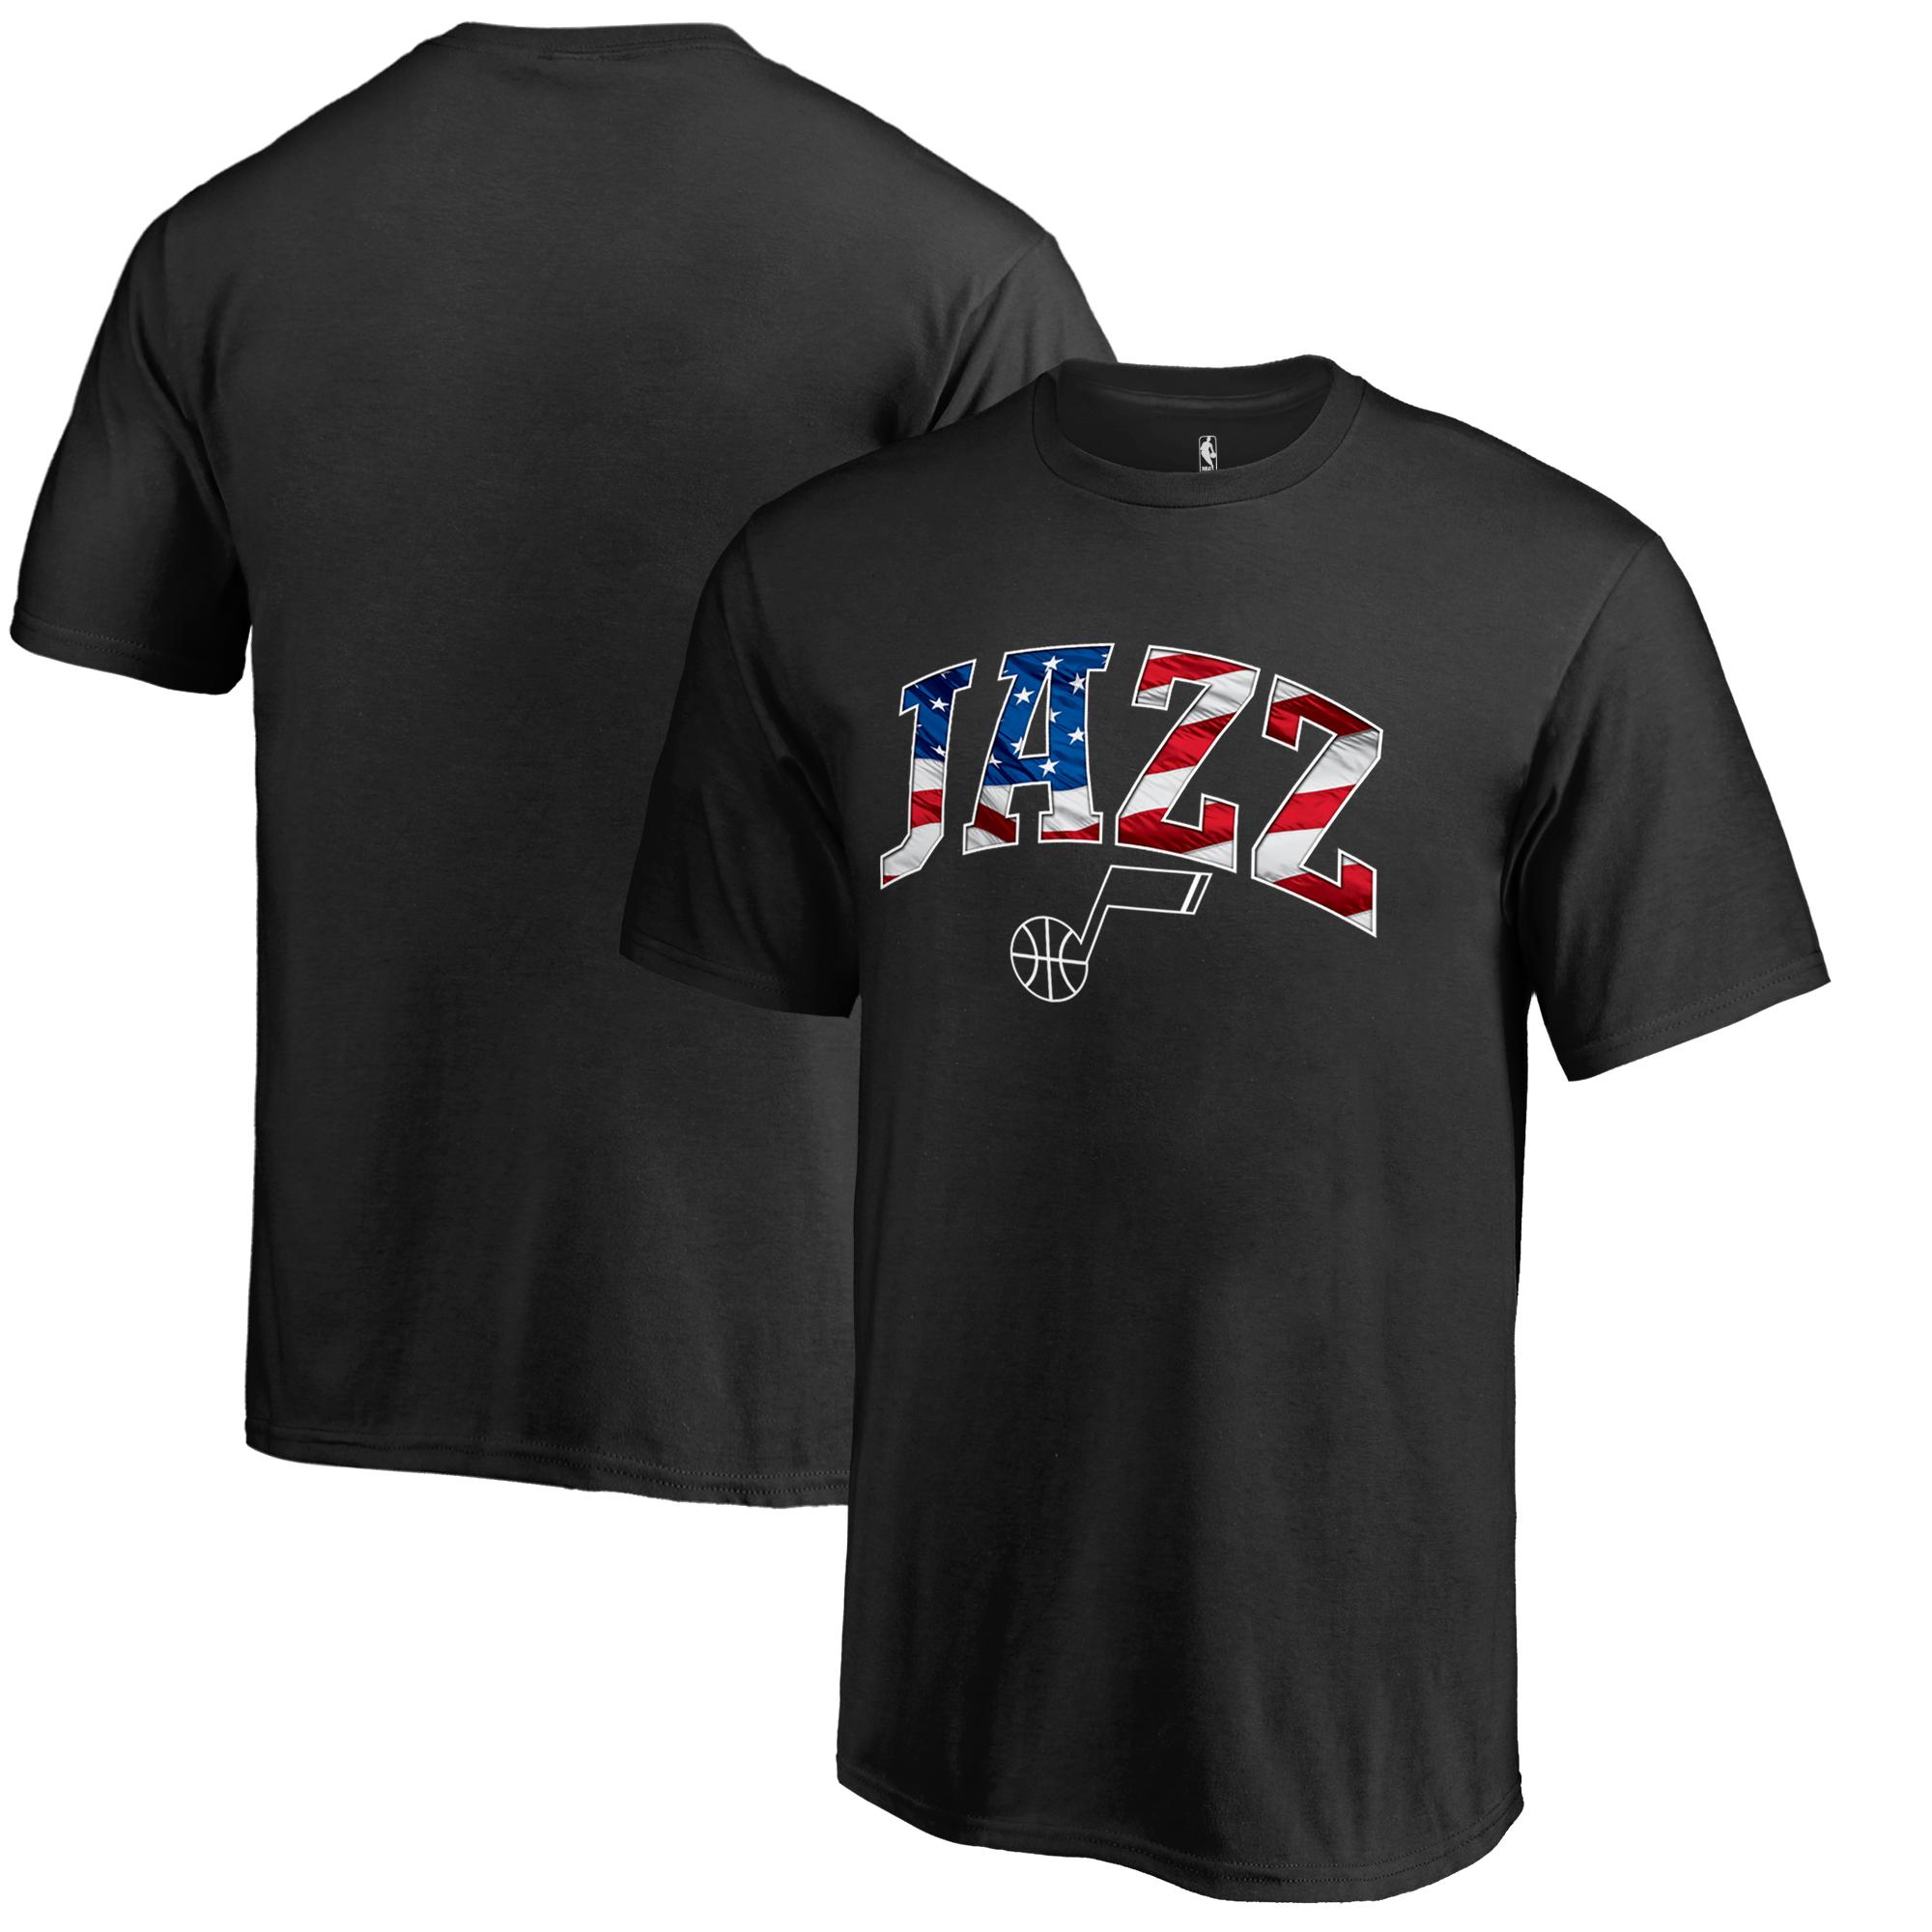 Utah Jazz Youth Banner Wave T-Shirt - Black